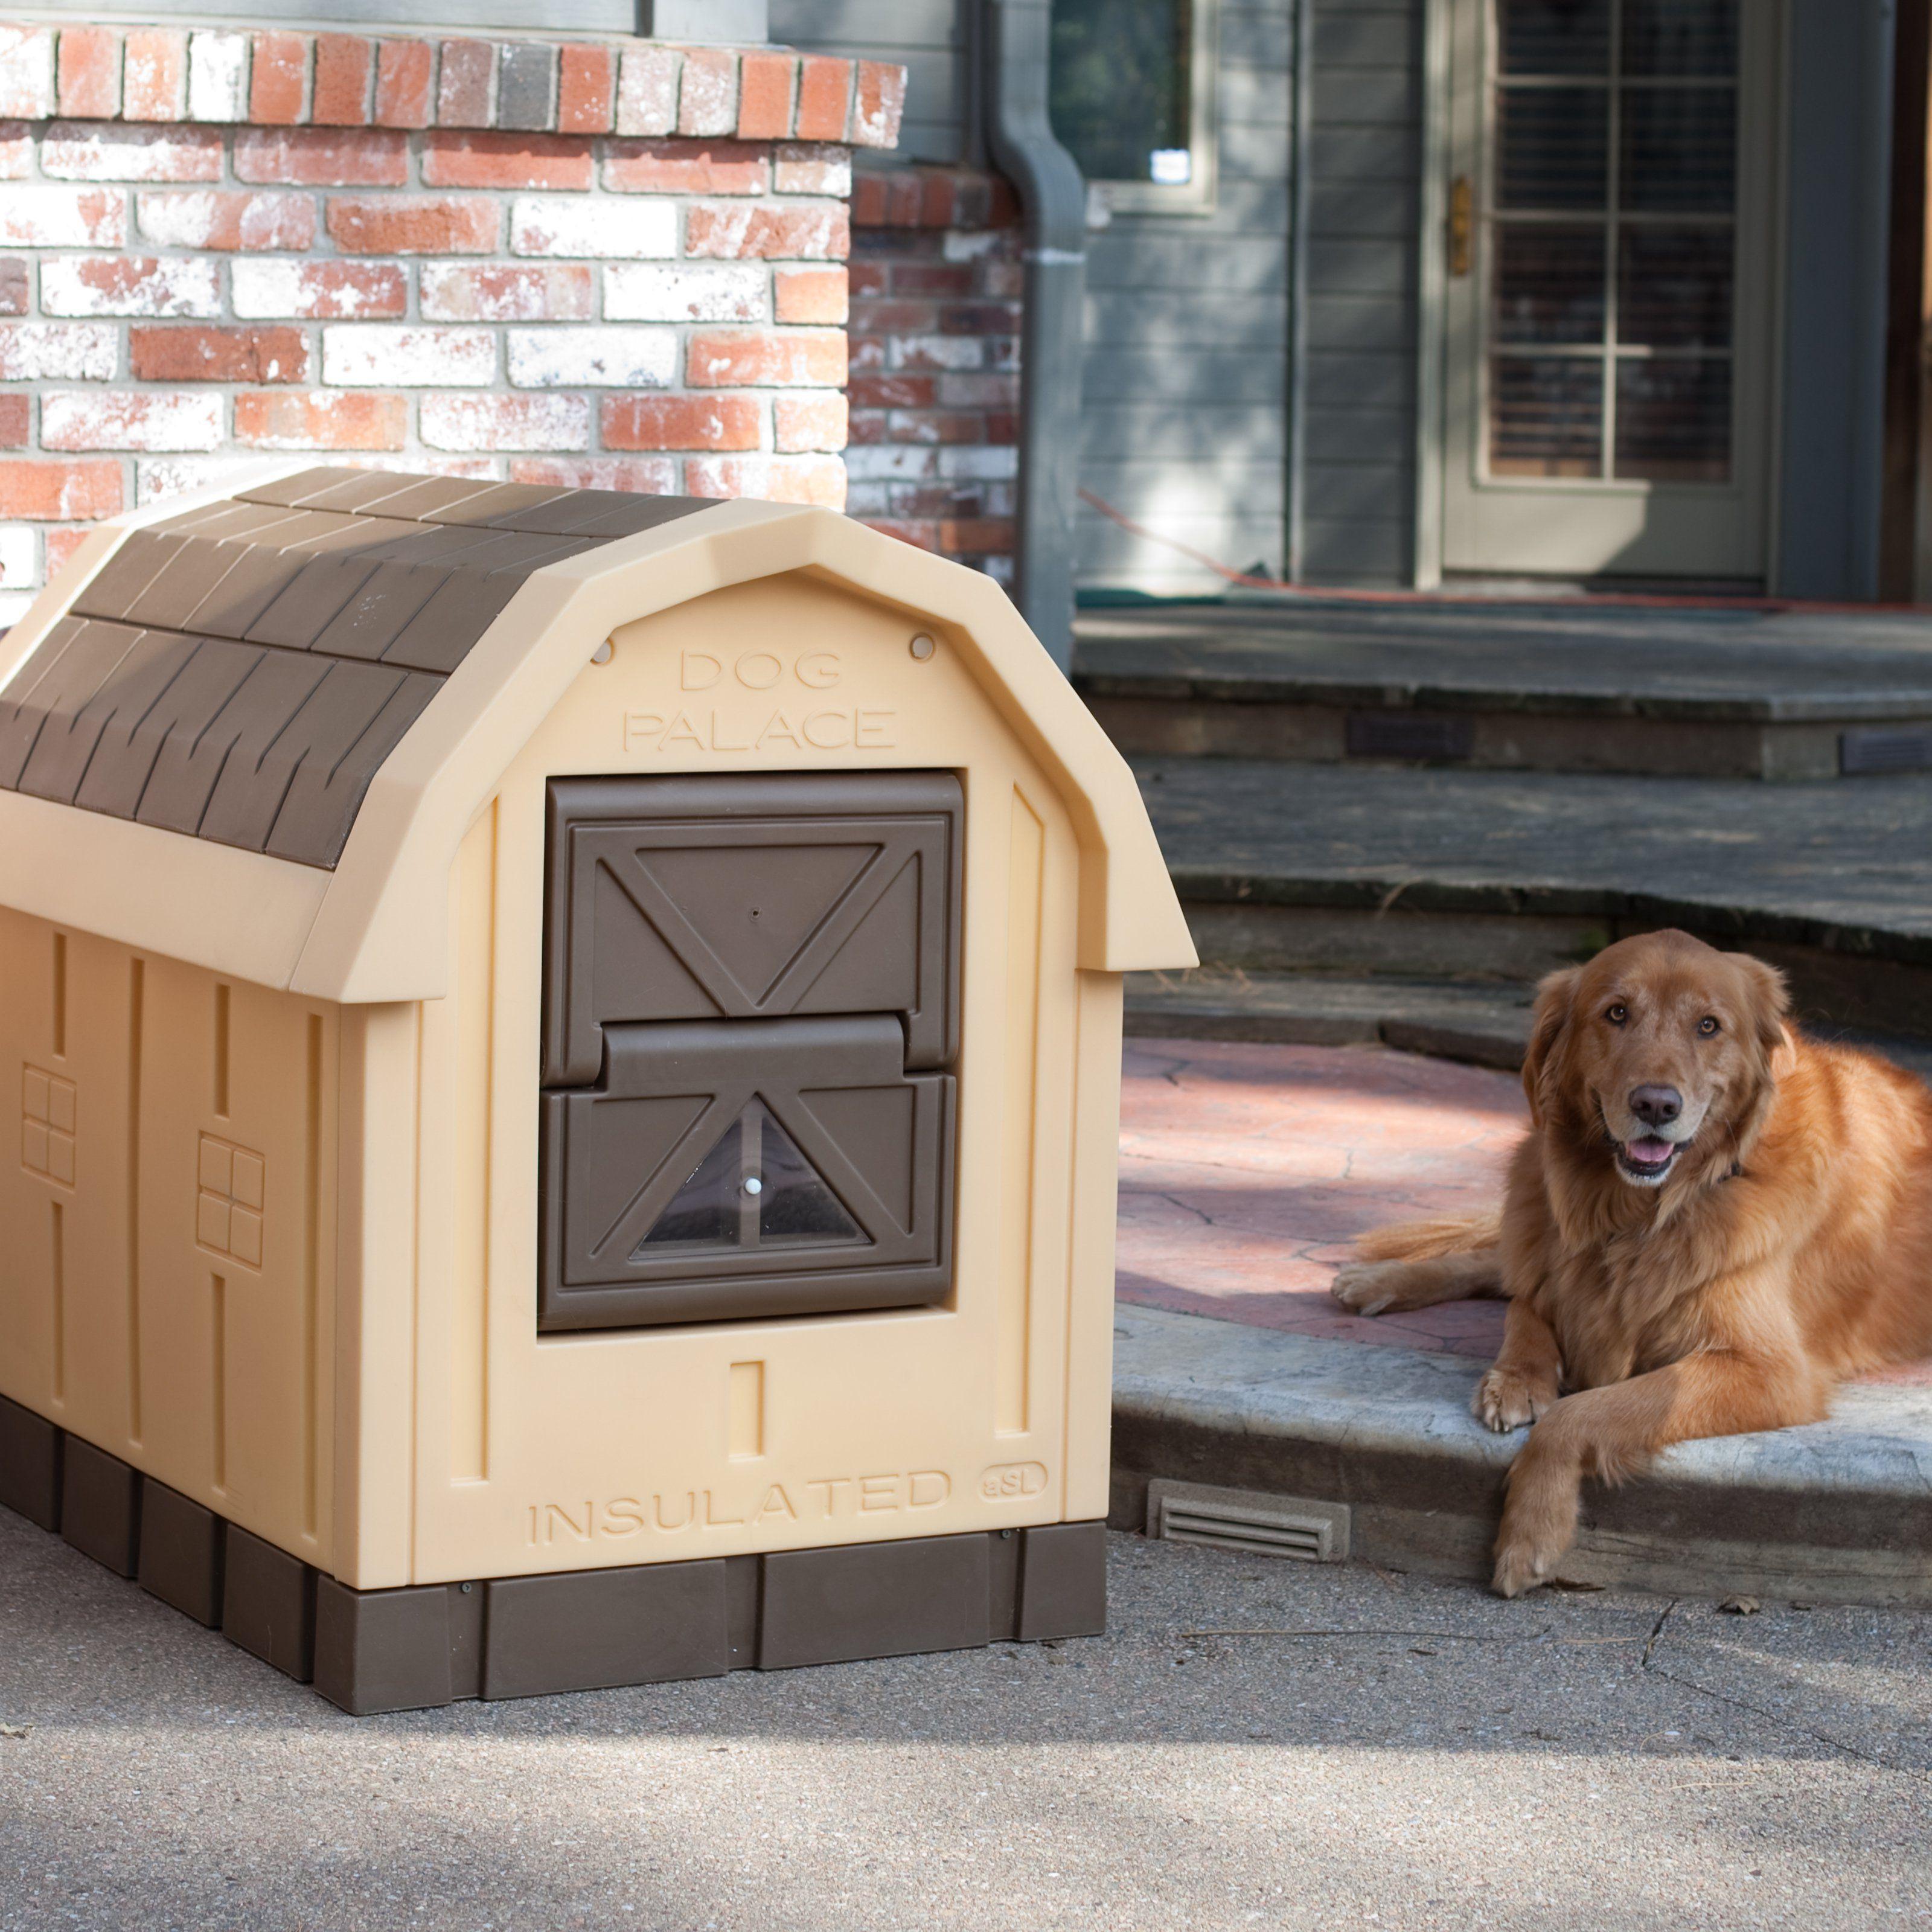 Dog Palace Insulated Dog House Dp20 Dp 20 Insulated Dog House